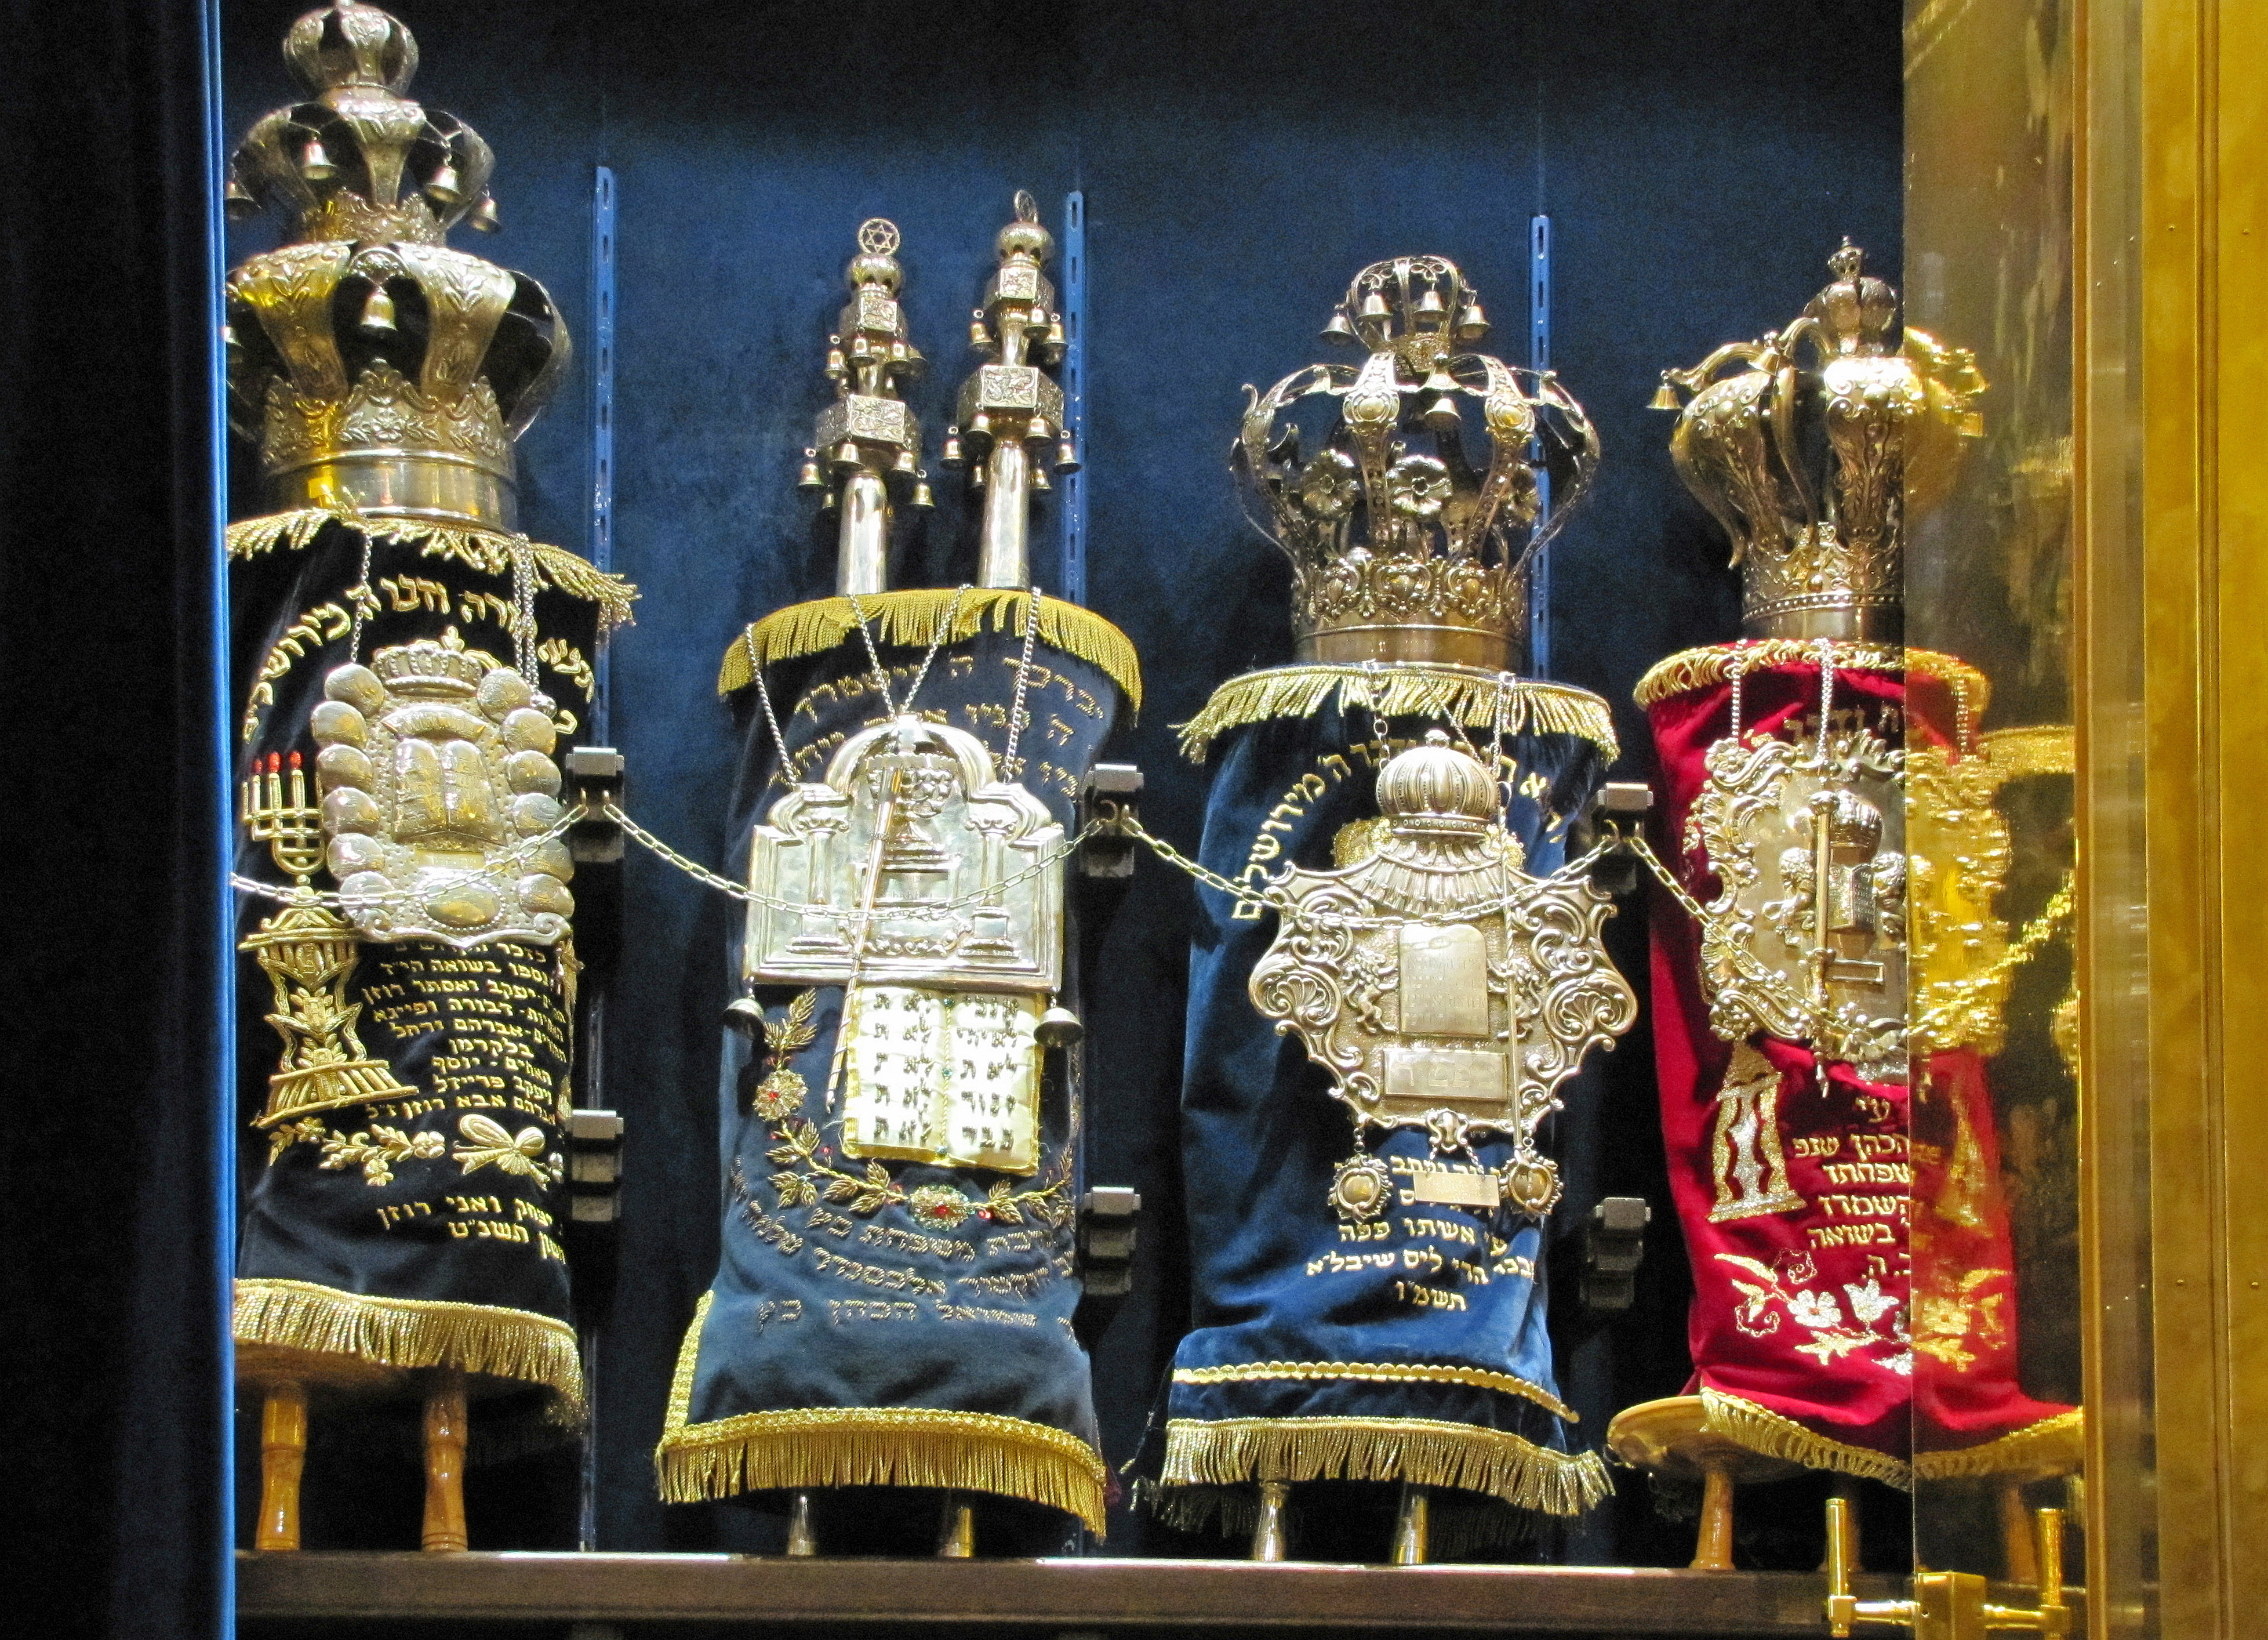 https://upload.wikimedia.org/wikipedia/commons/5/57/Westend-synagoge-toraschrein-2010-ffm-109.jpg